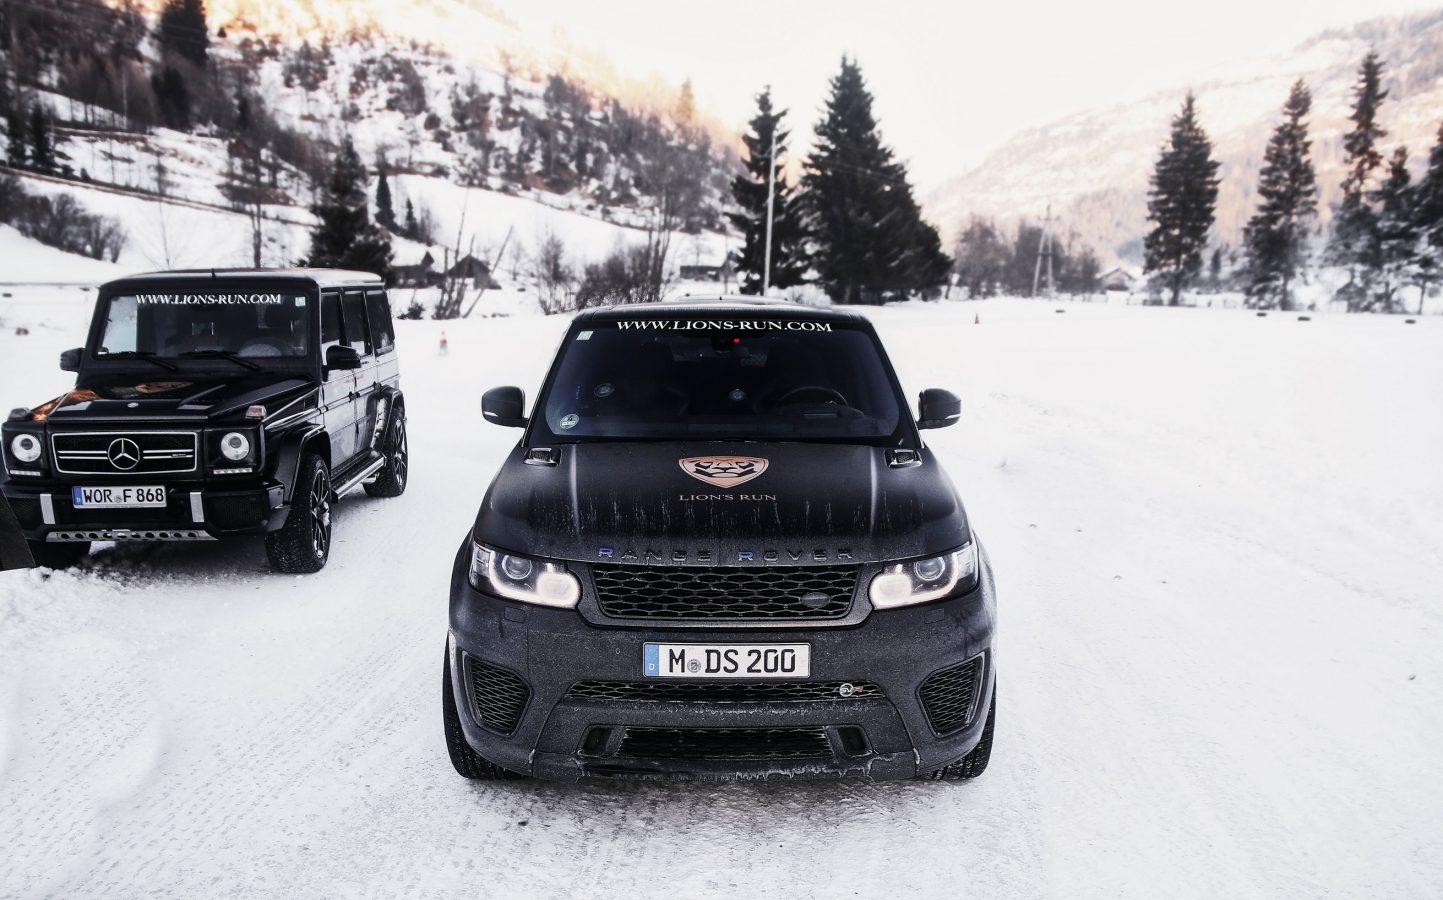 Lions_Run_winter_edition-2017_157-2